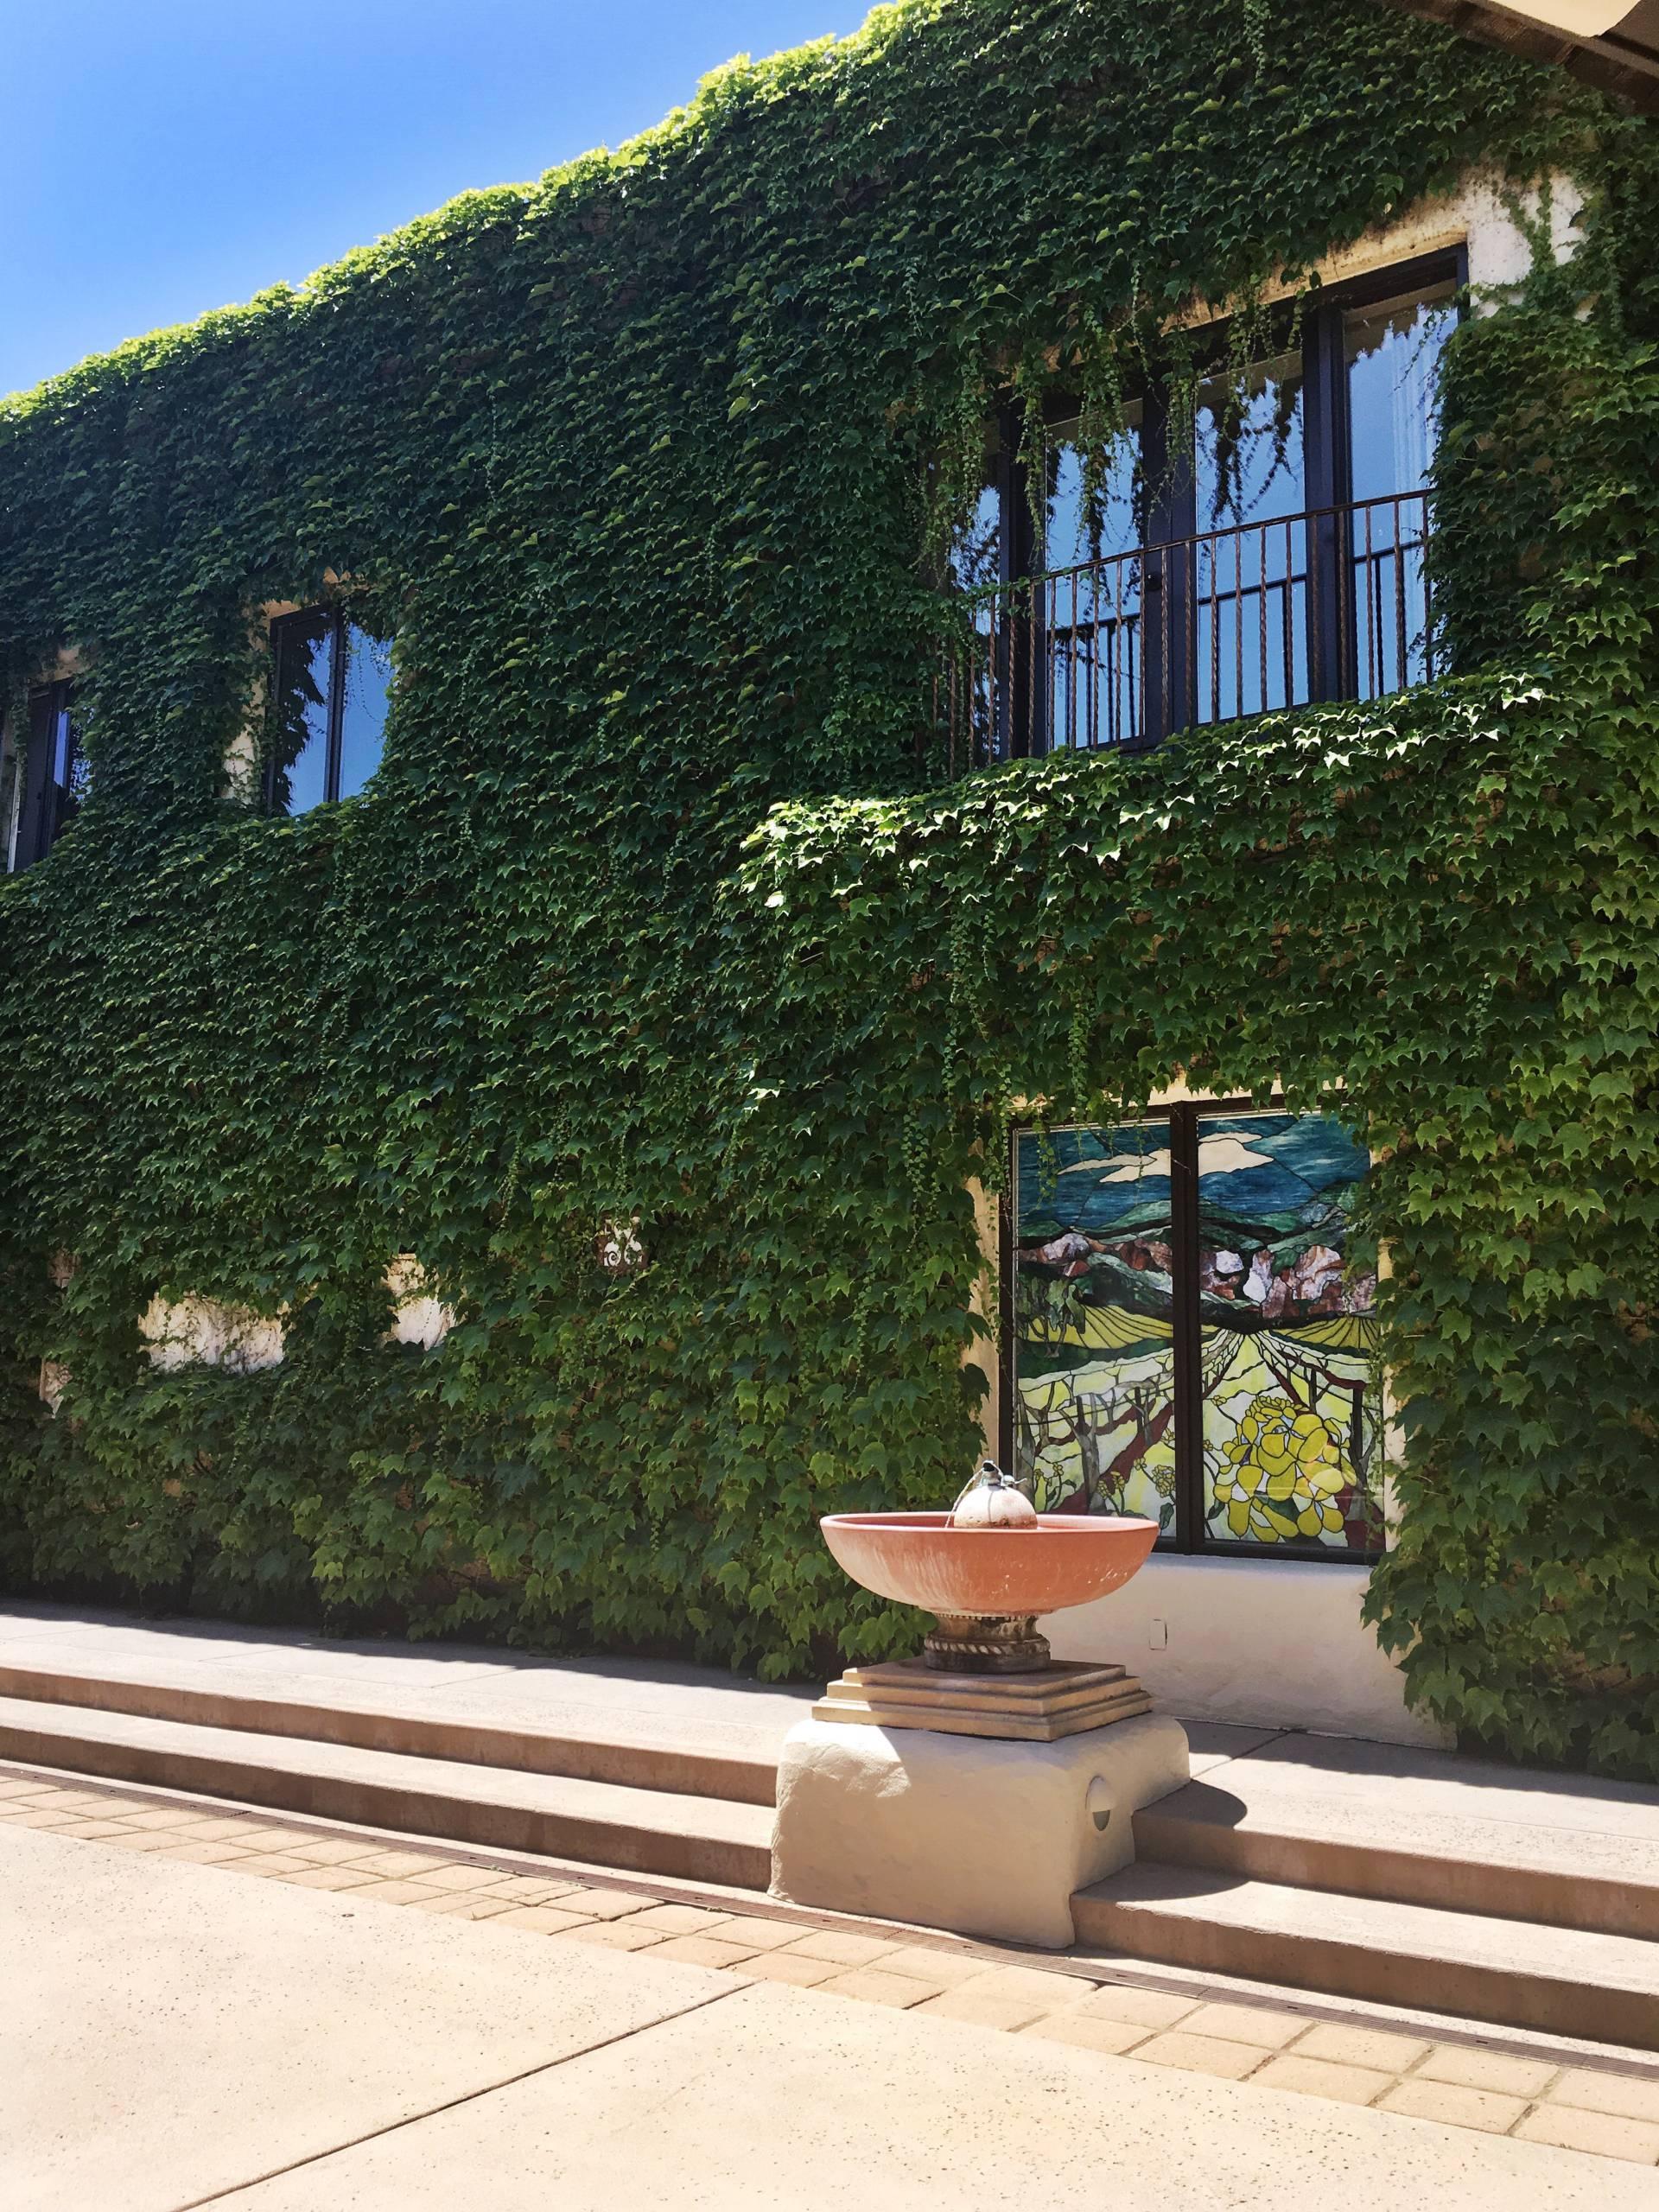 napa-valley- ivy walls